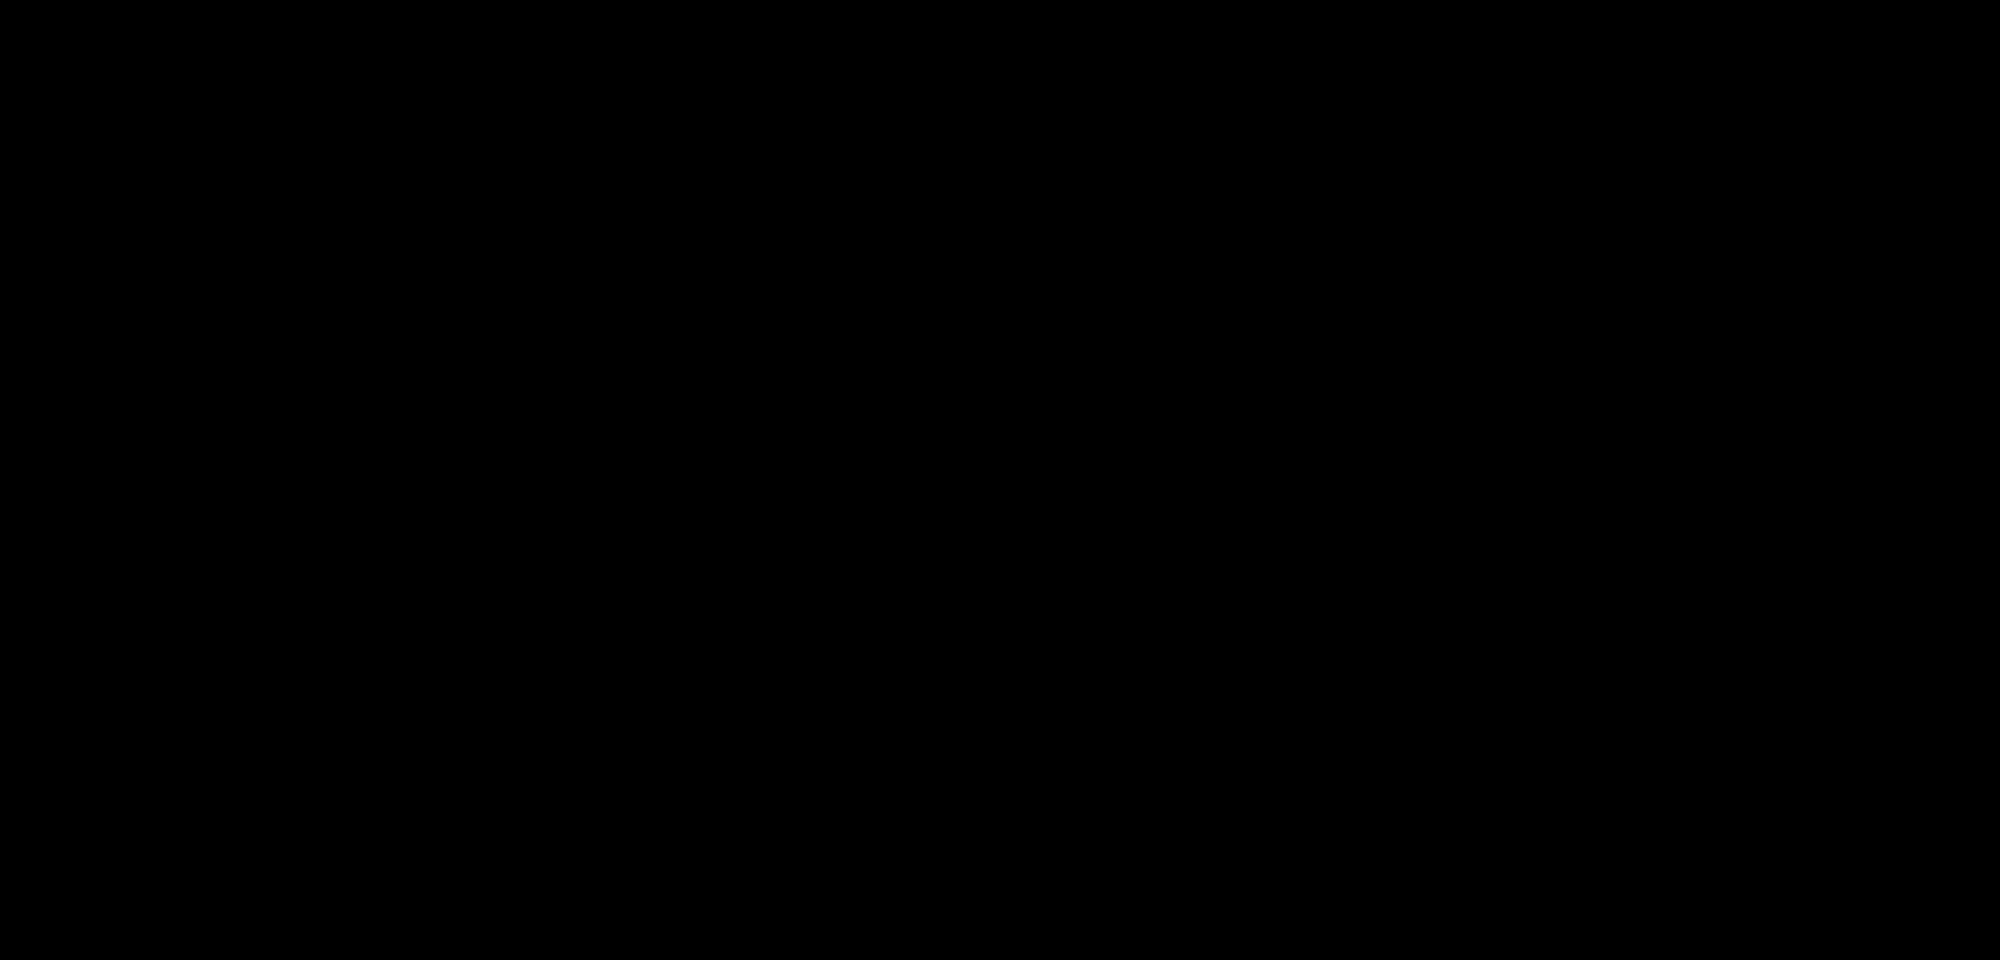 aca_003